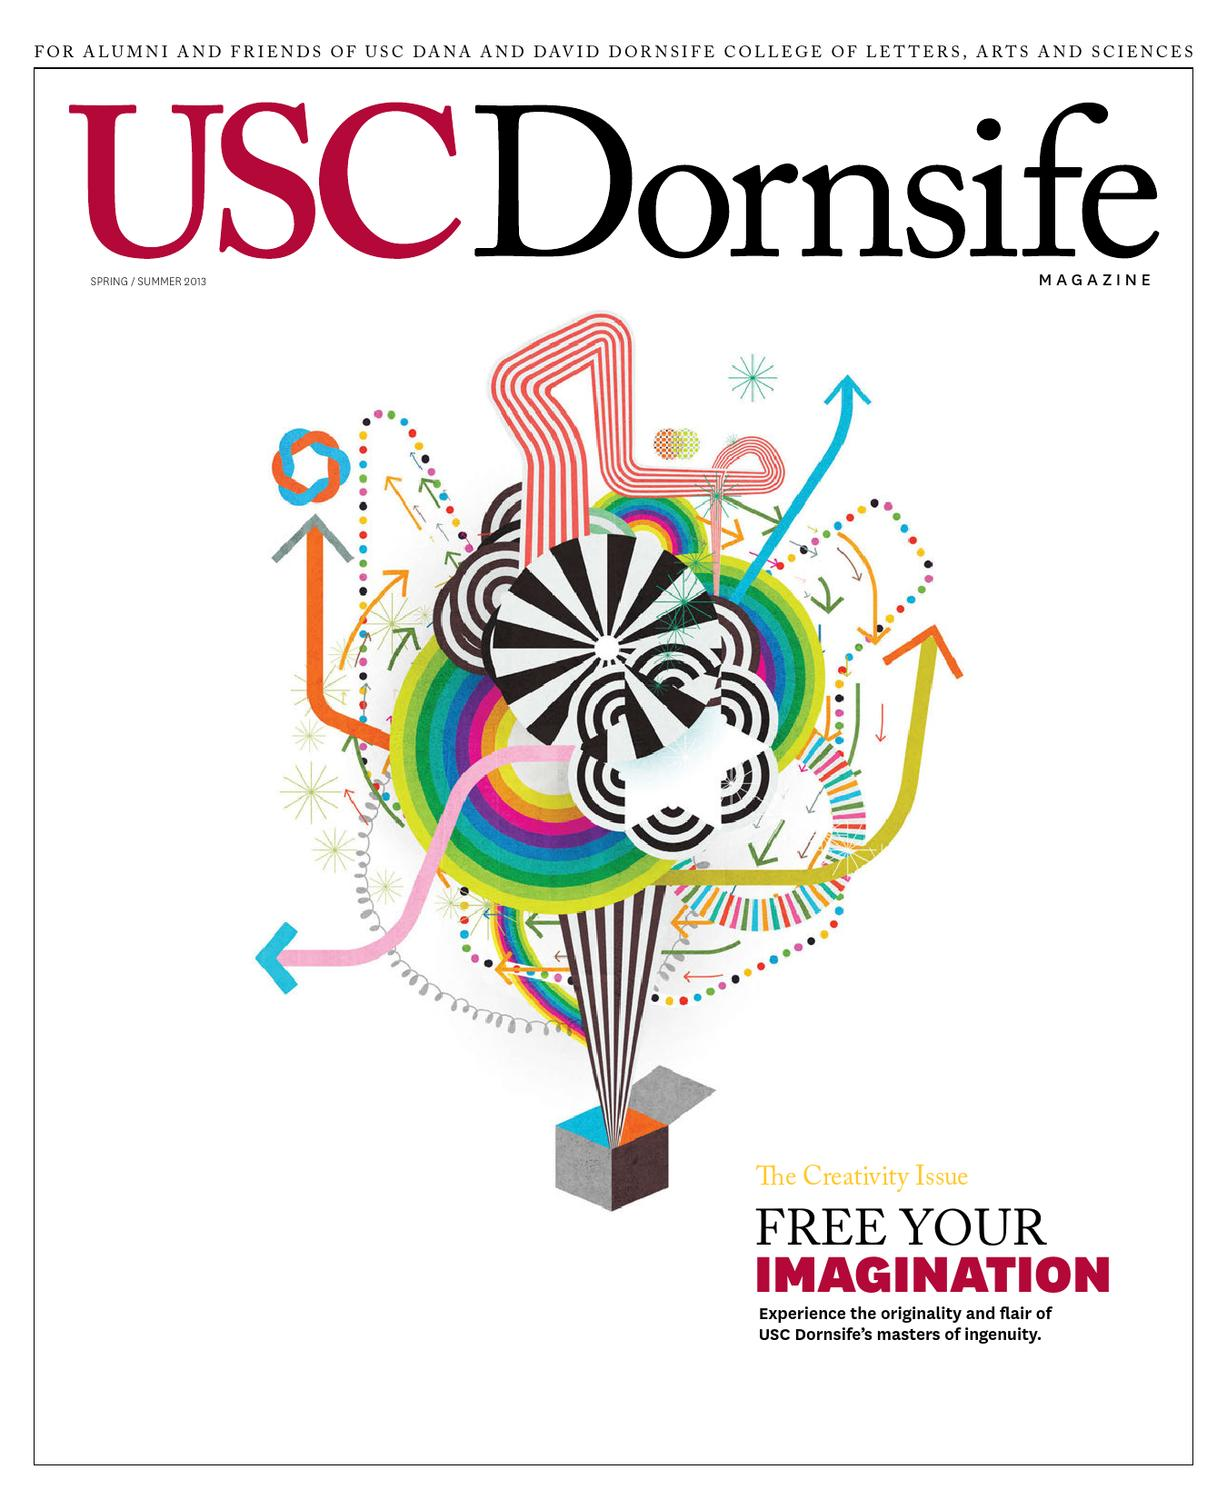 USC Dornsife Life Magazine Spring/Summer 2013 by University